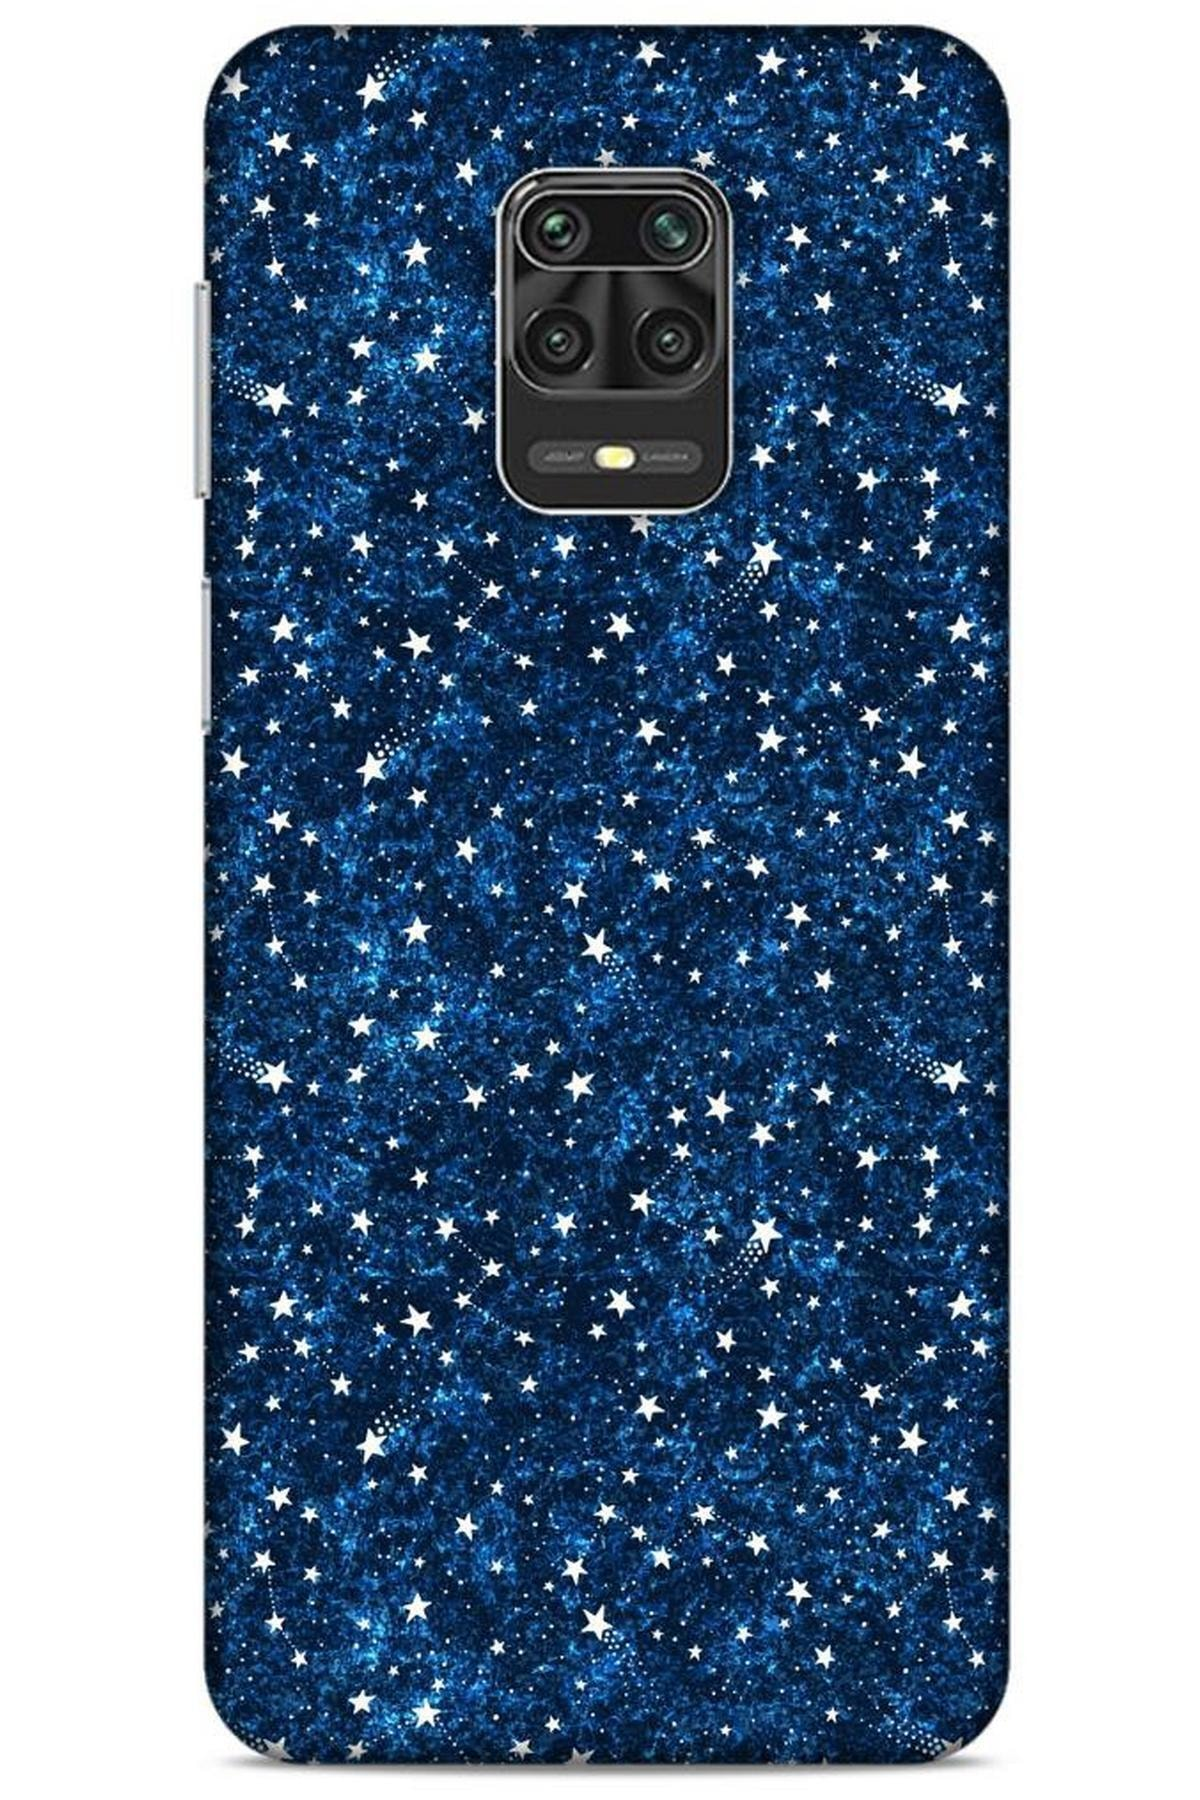 Lopard Spacex (4) Tema Koruma Kılıfı Xiaomi Redmi Note 9s Kılıf 1